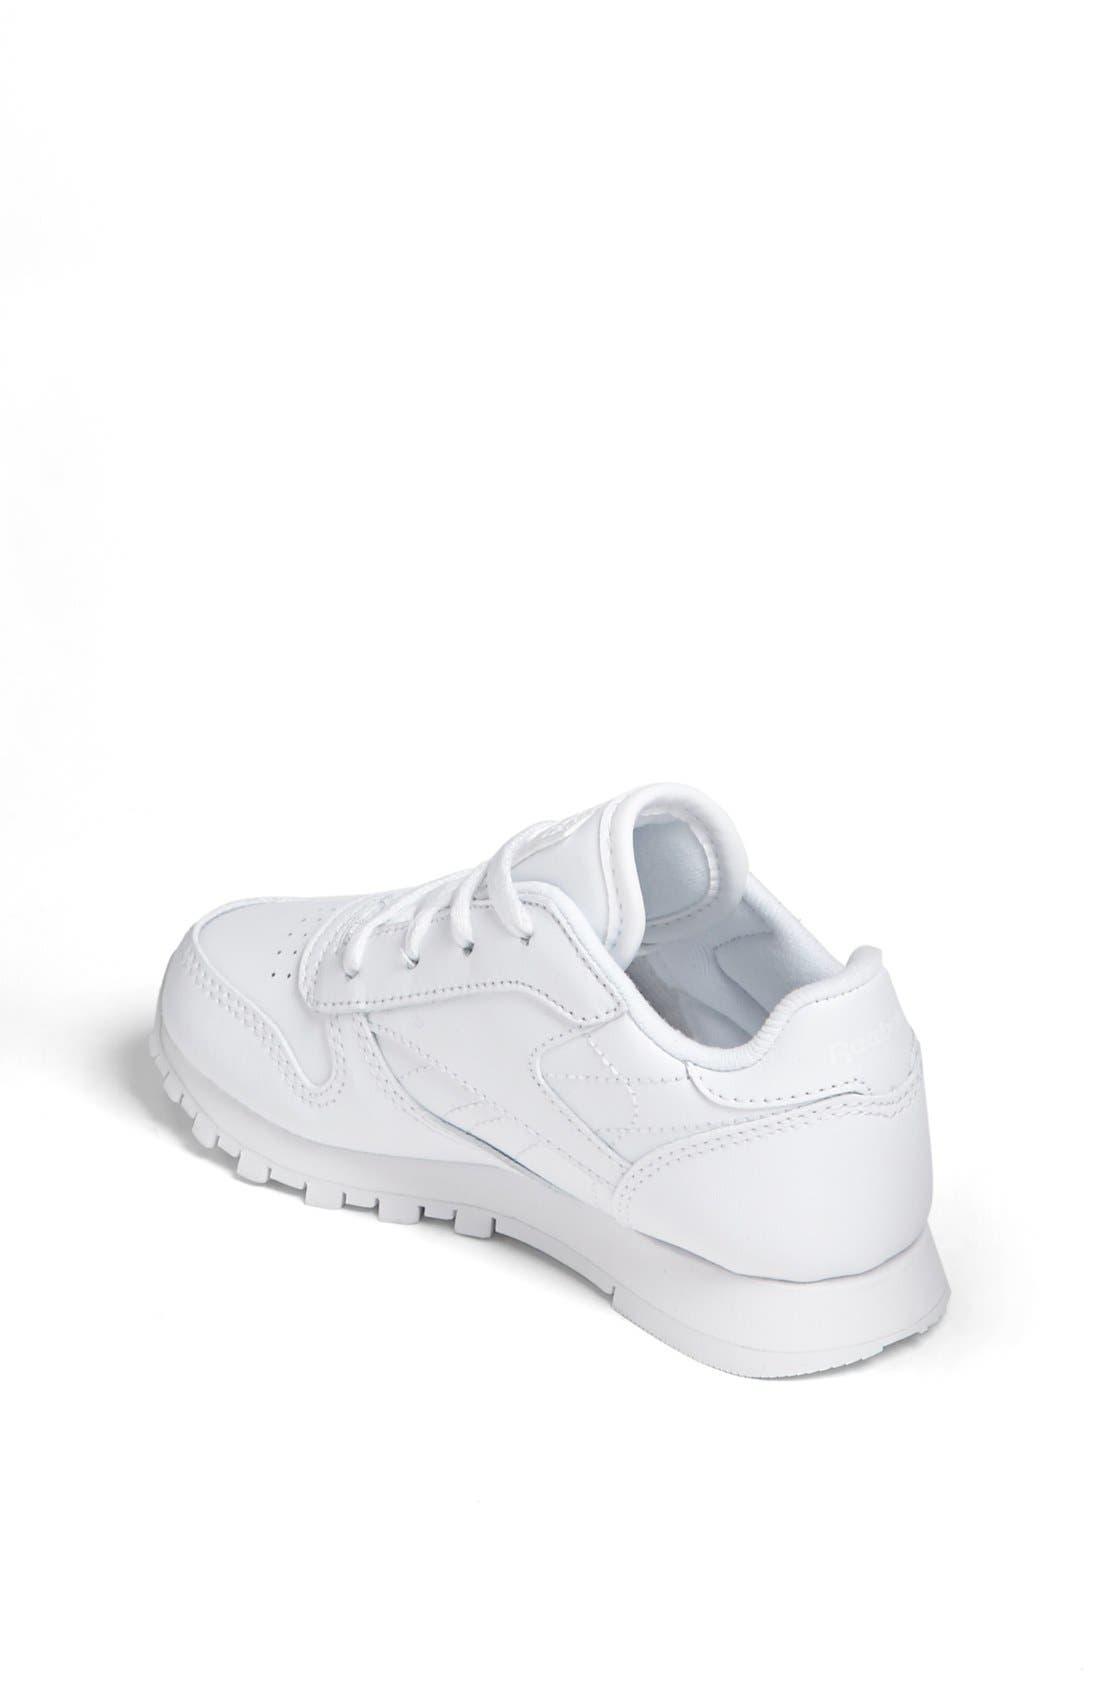 Alternate Image 2  - Reebok 'Classic' Leather Sneaker (Baby, Walker & Toddler)